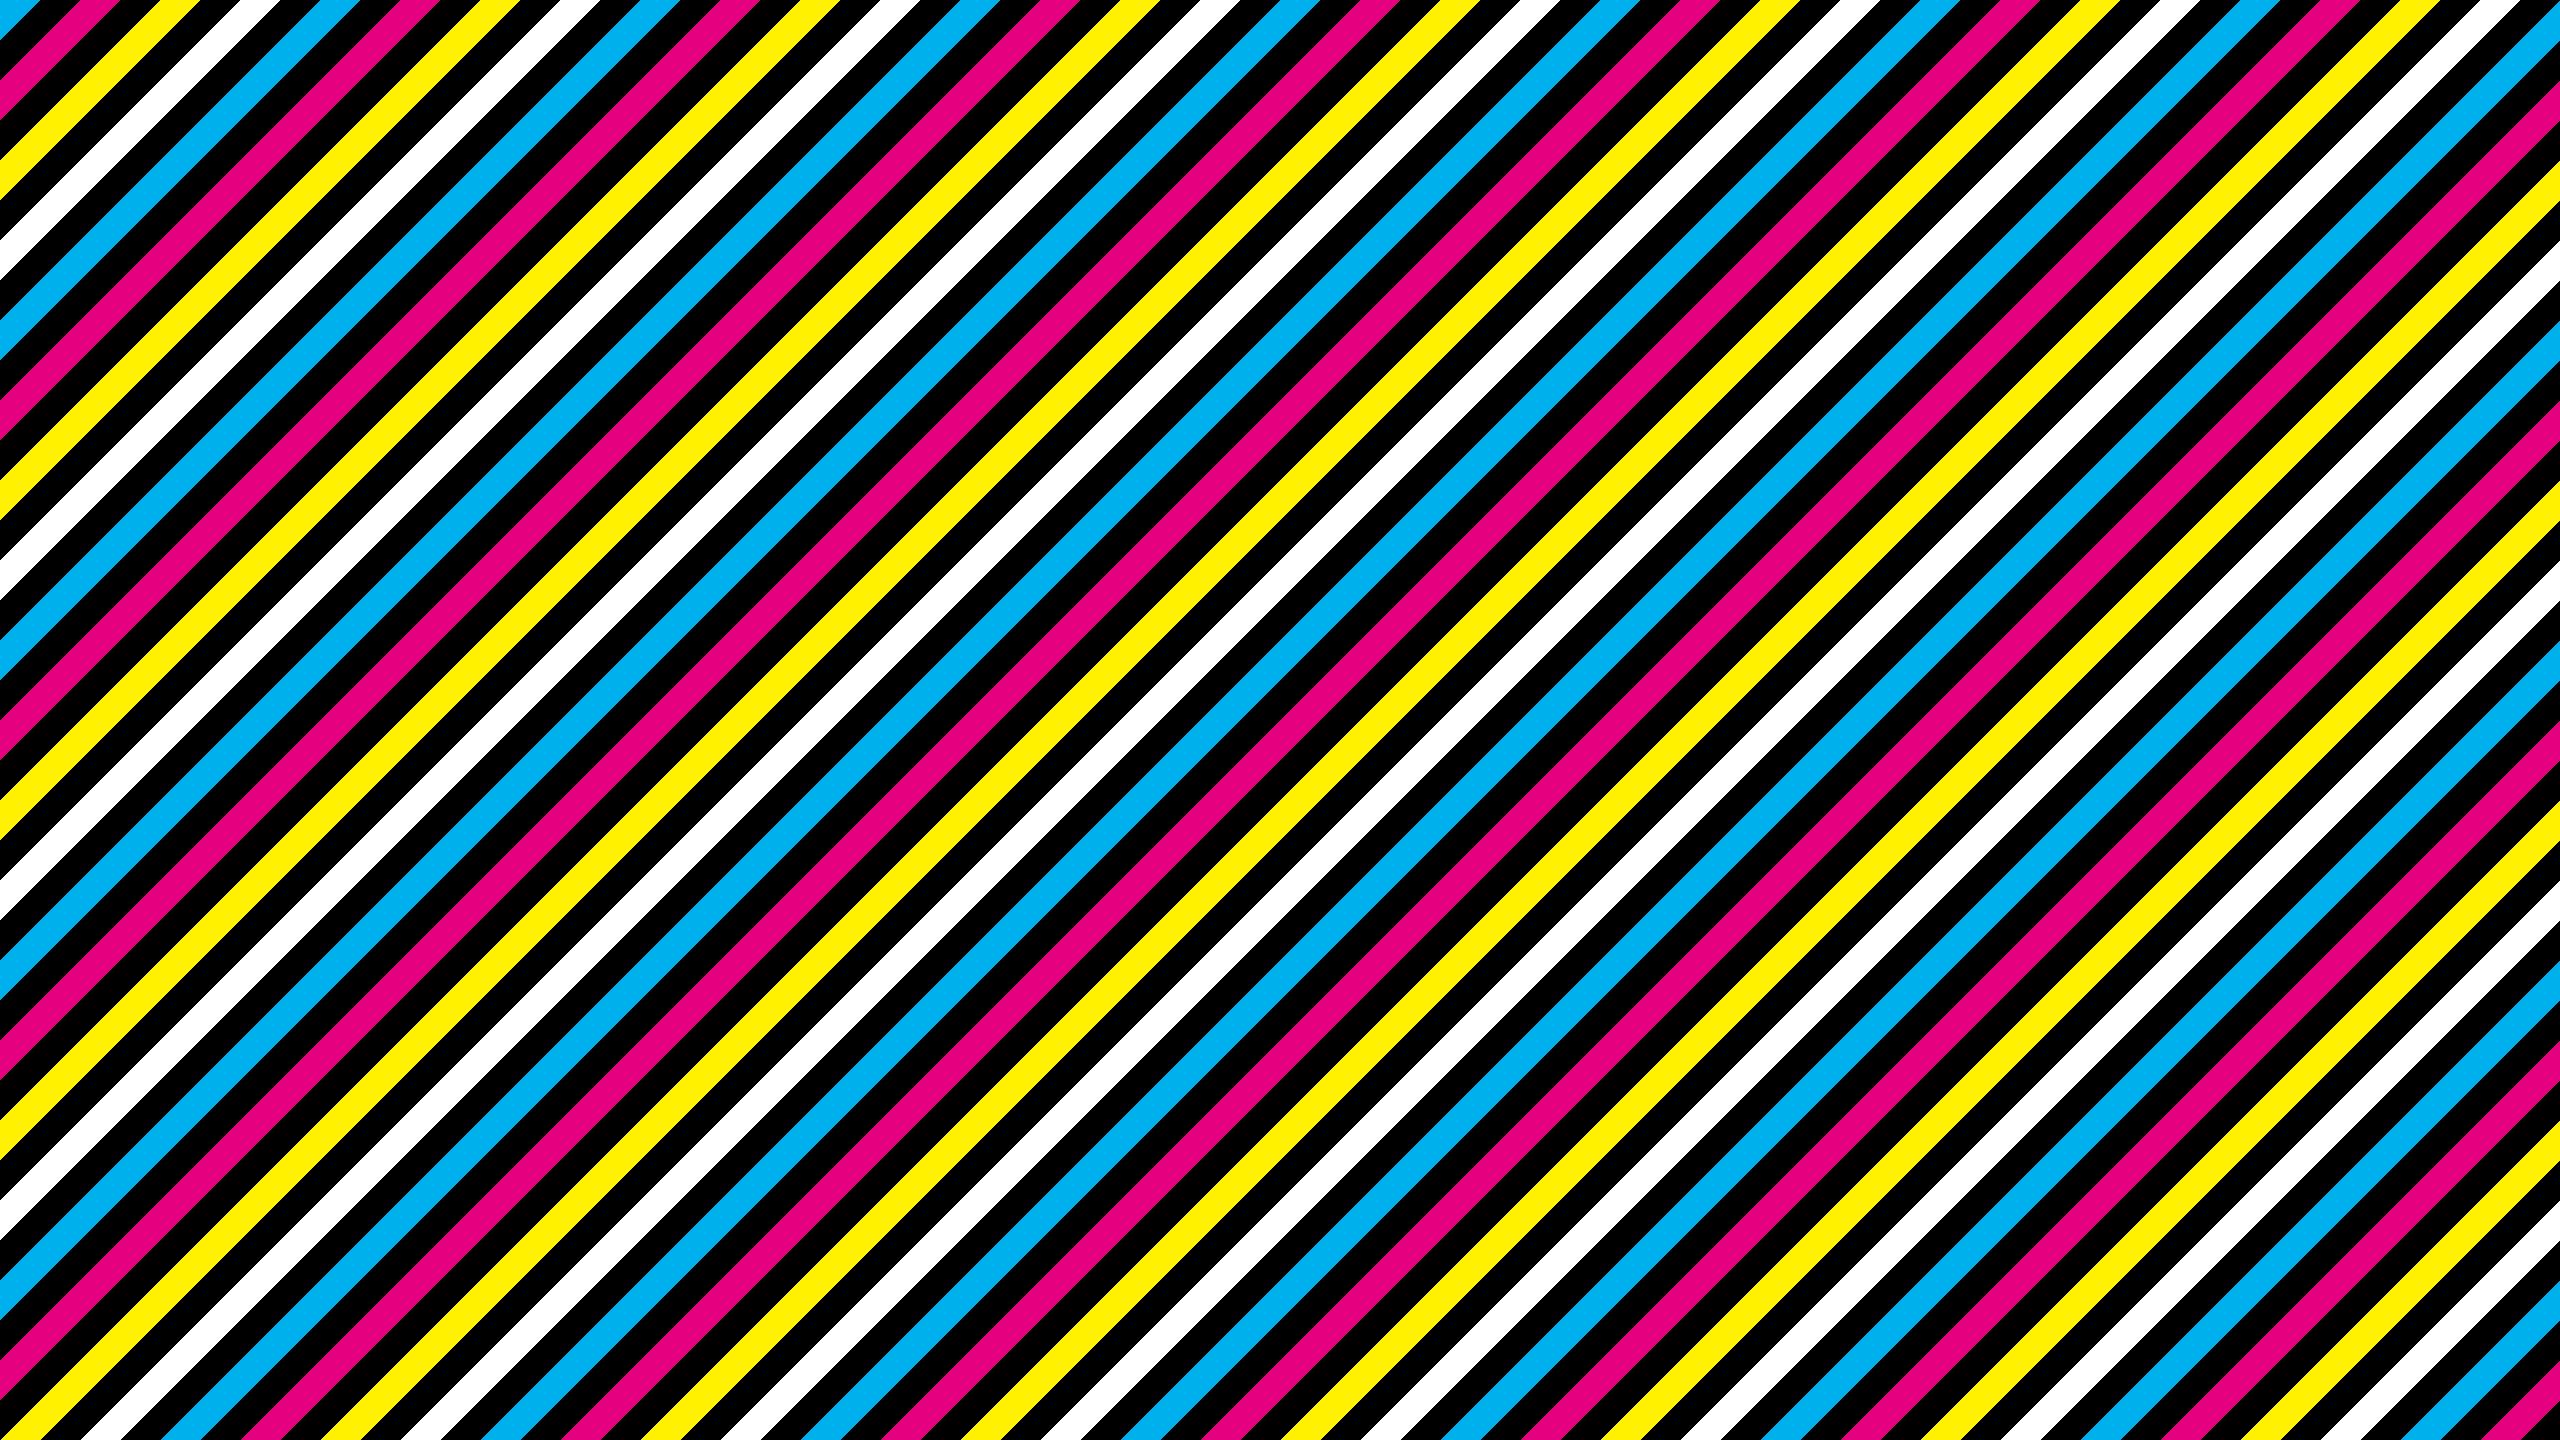 1980s wallpaper patterns - Google Search